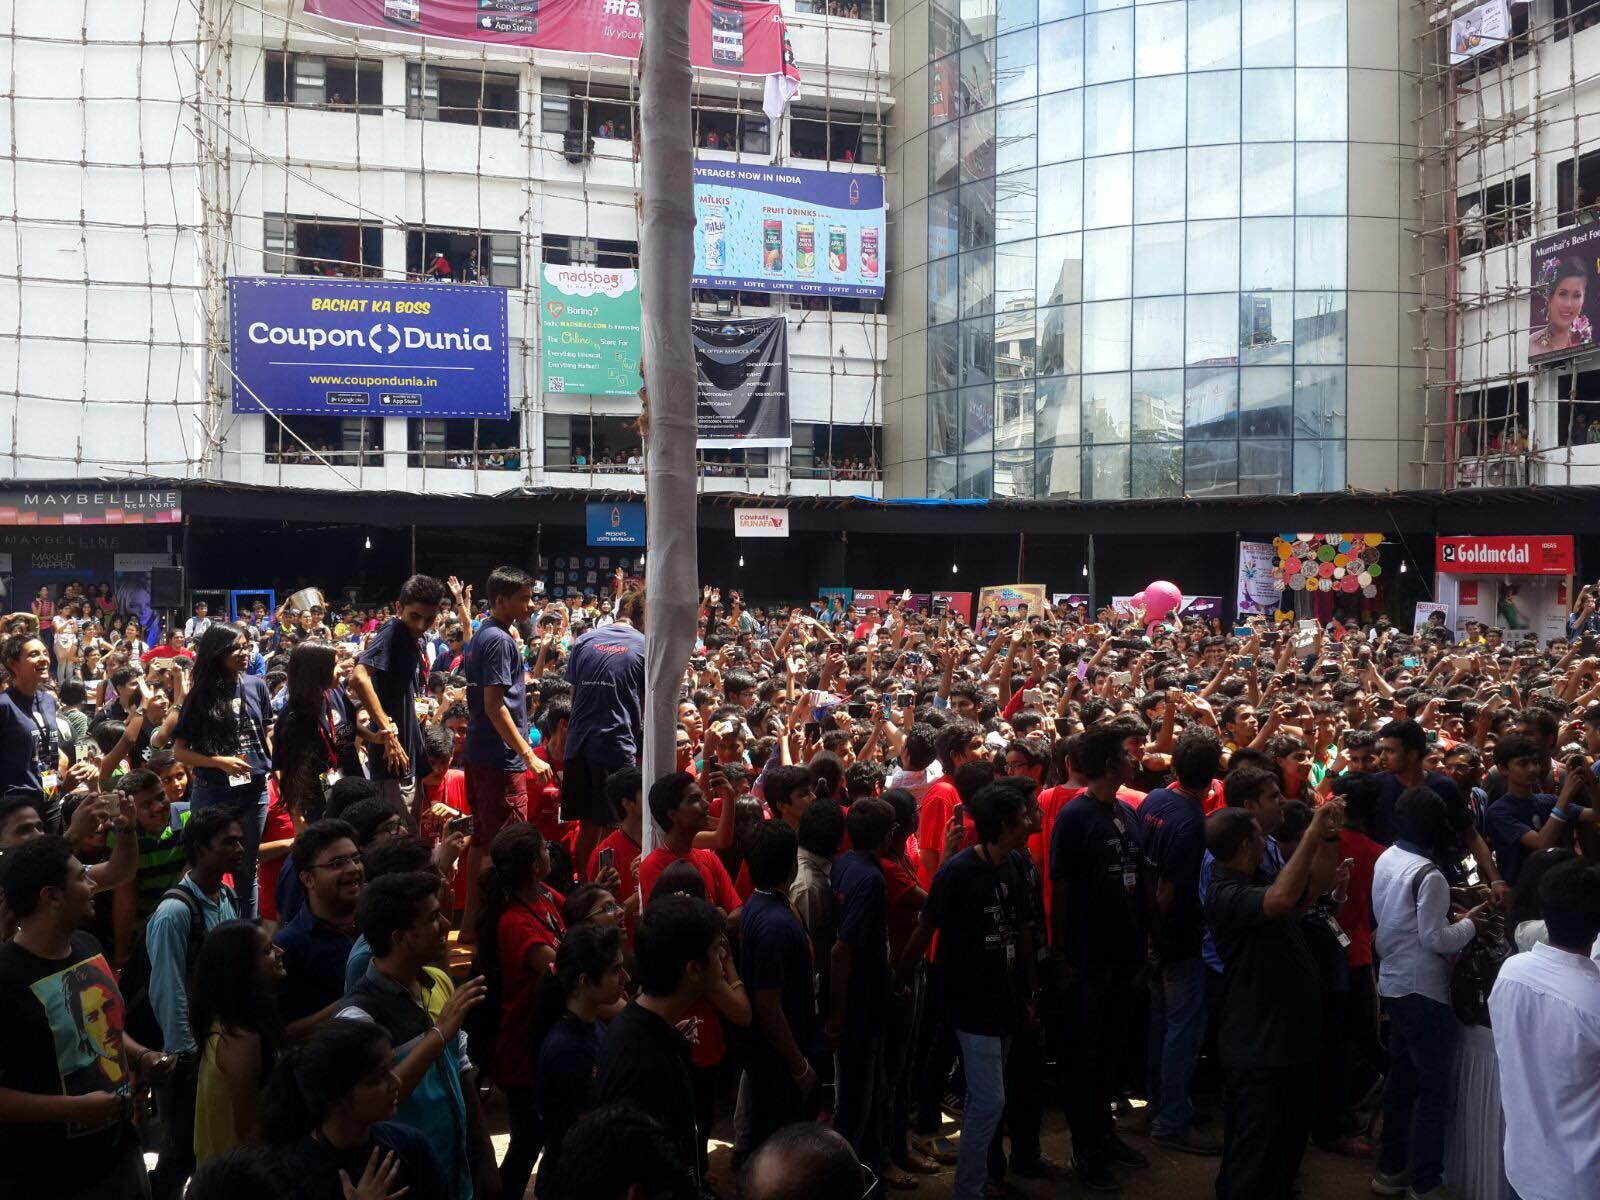 Crowd cheering for Kapil Sharma